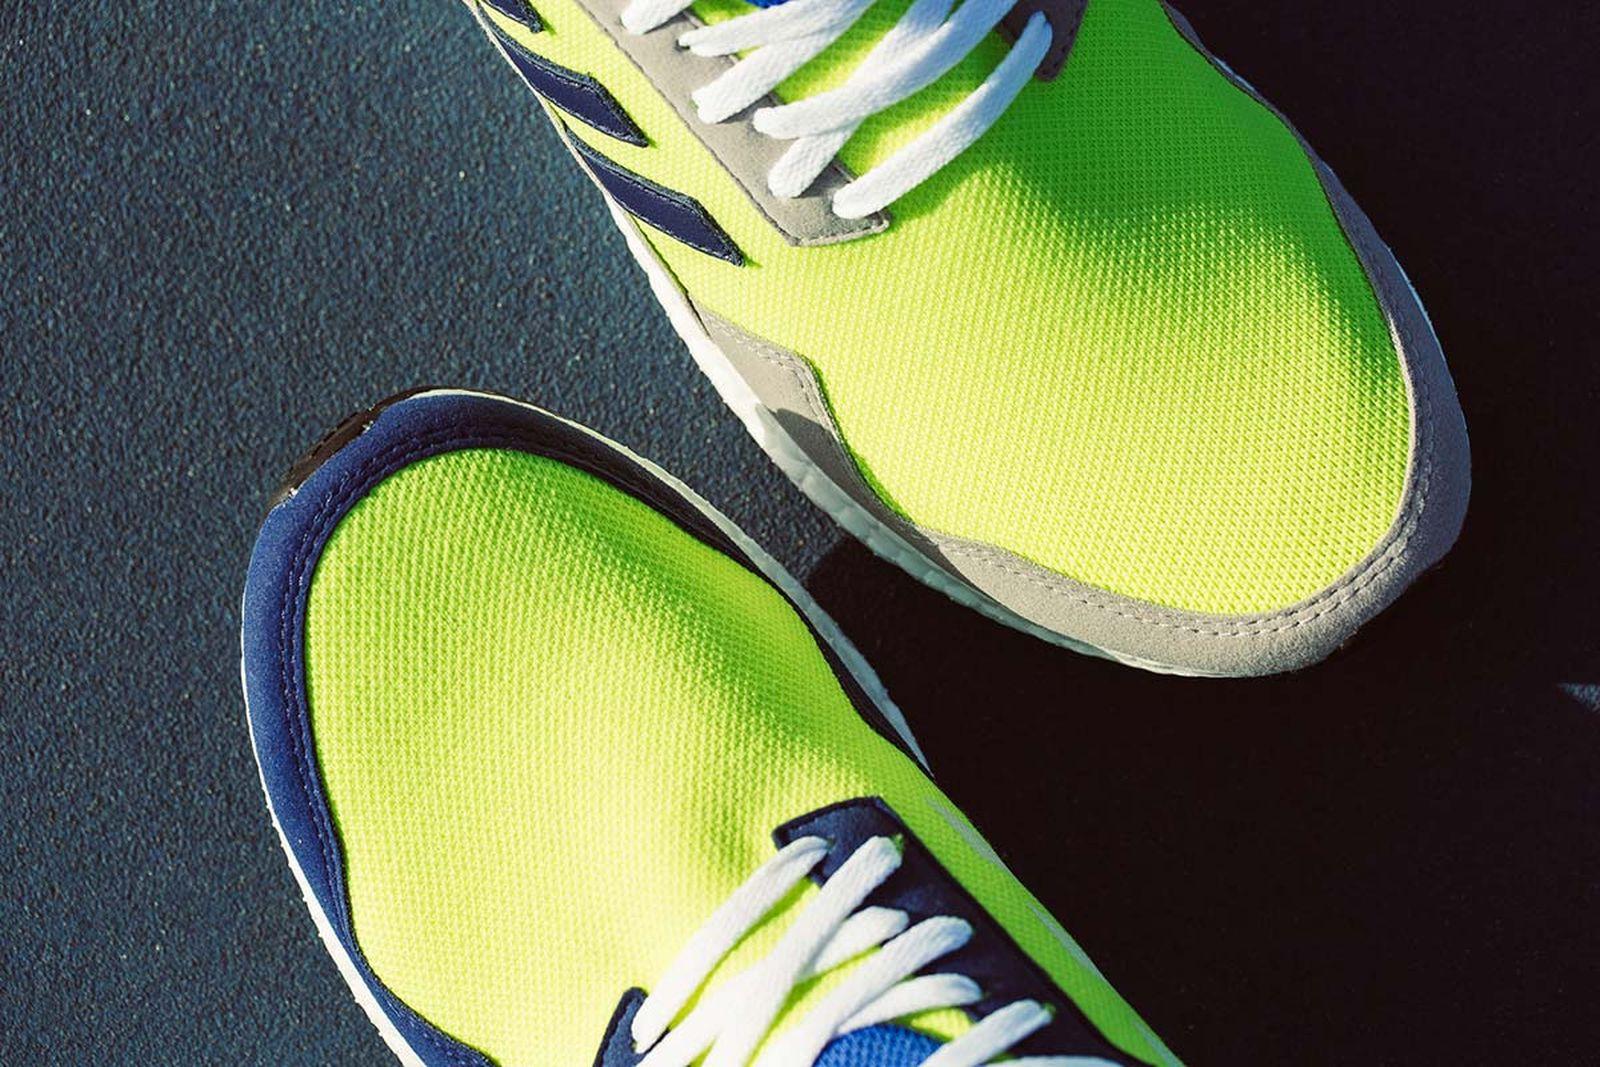 adidas-consortium-ultraboost-mid-prototype-release-date-price-05